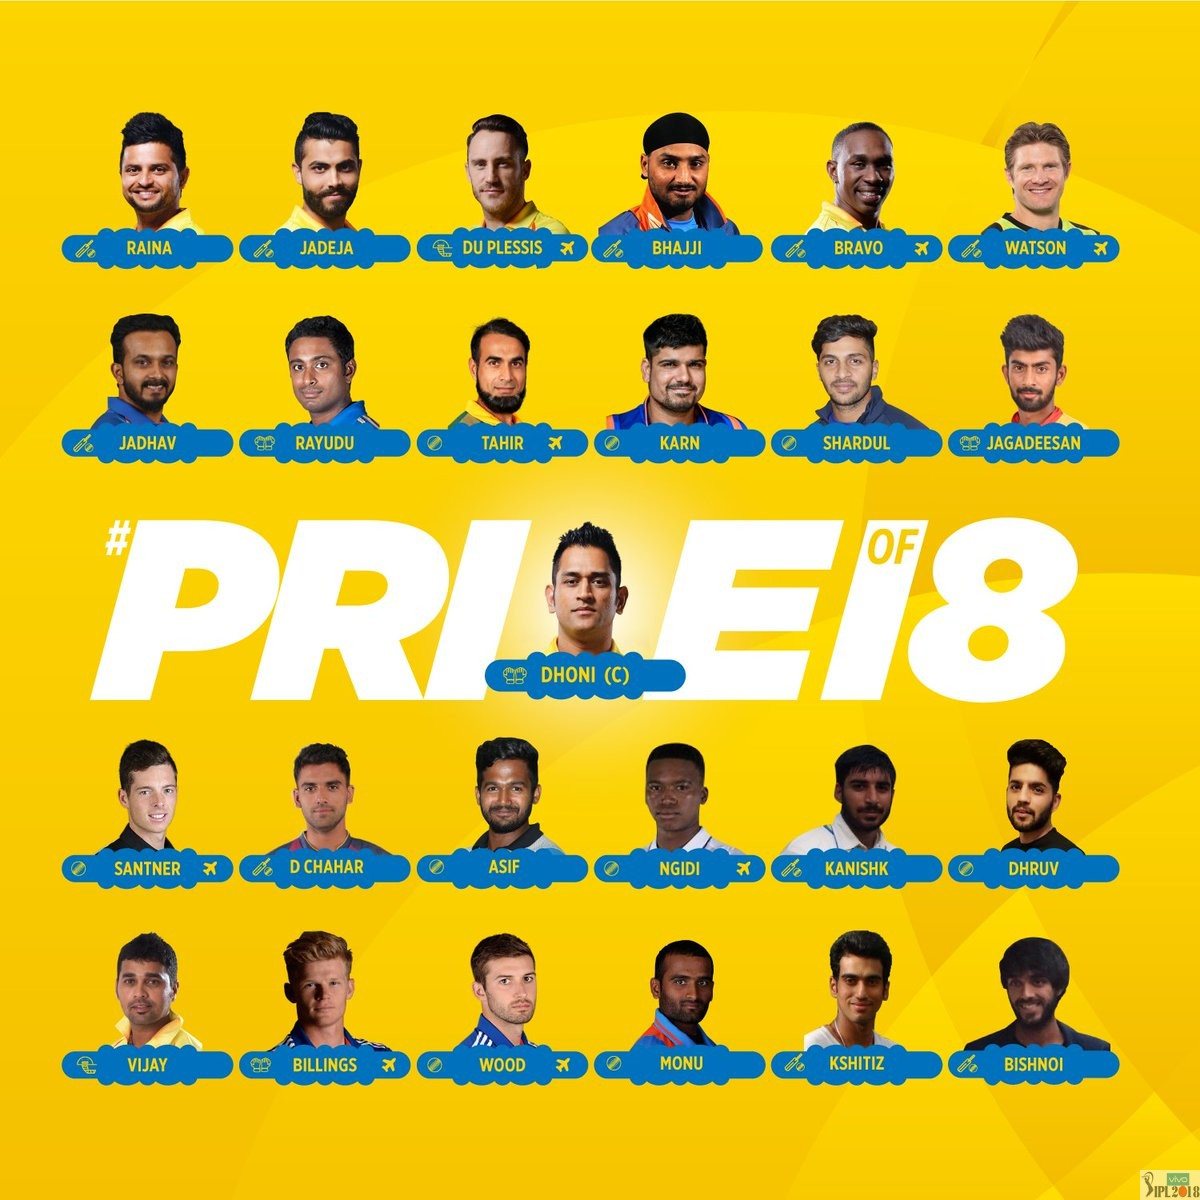 ipl 2018 chennai super kings team squad and players list